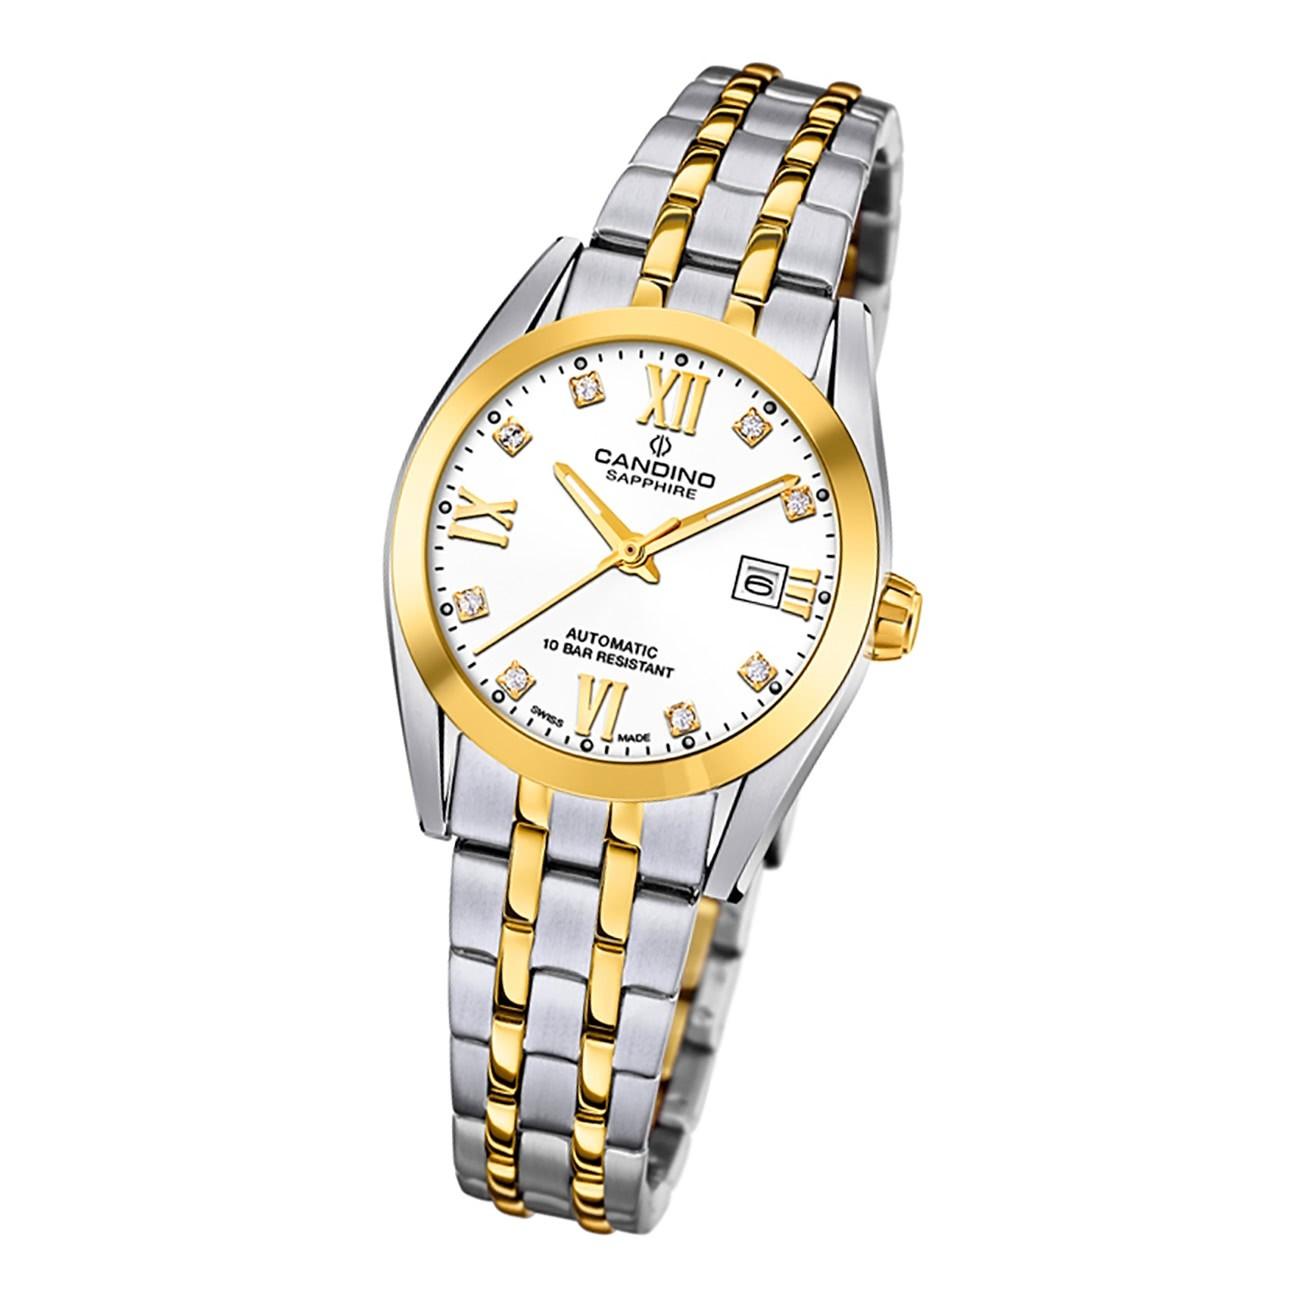 Candino Damen Armbanduhr Automatik C4704/1 Analog Edelstahl silber gold UC4704/1